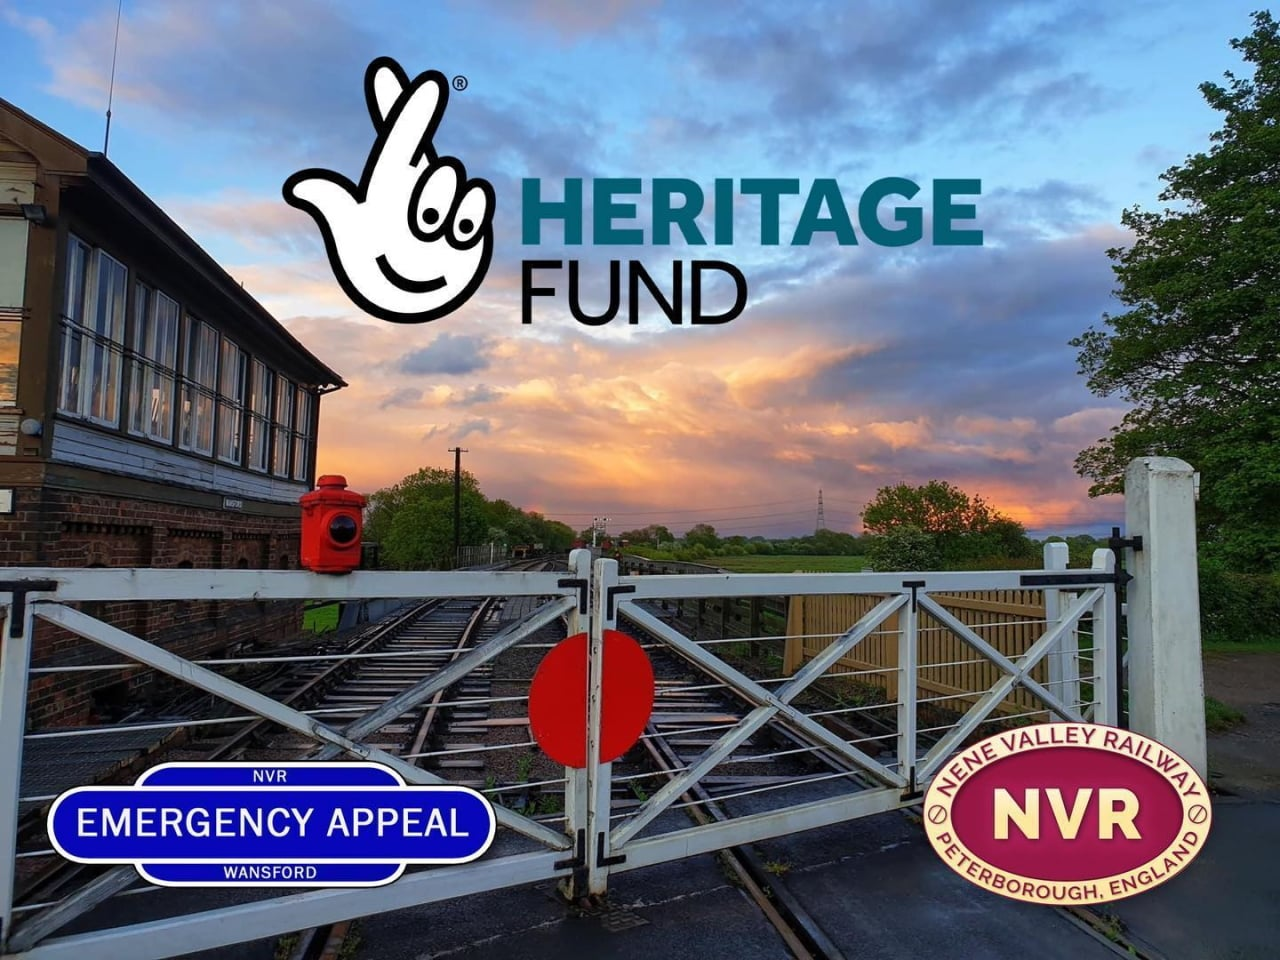 Nene Valley Railwya receive National Lottery Grant